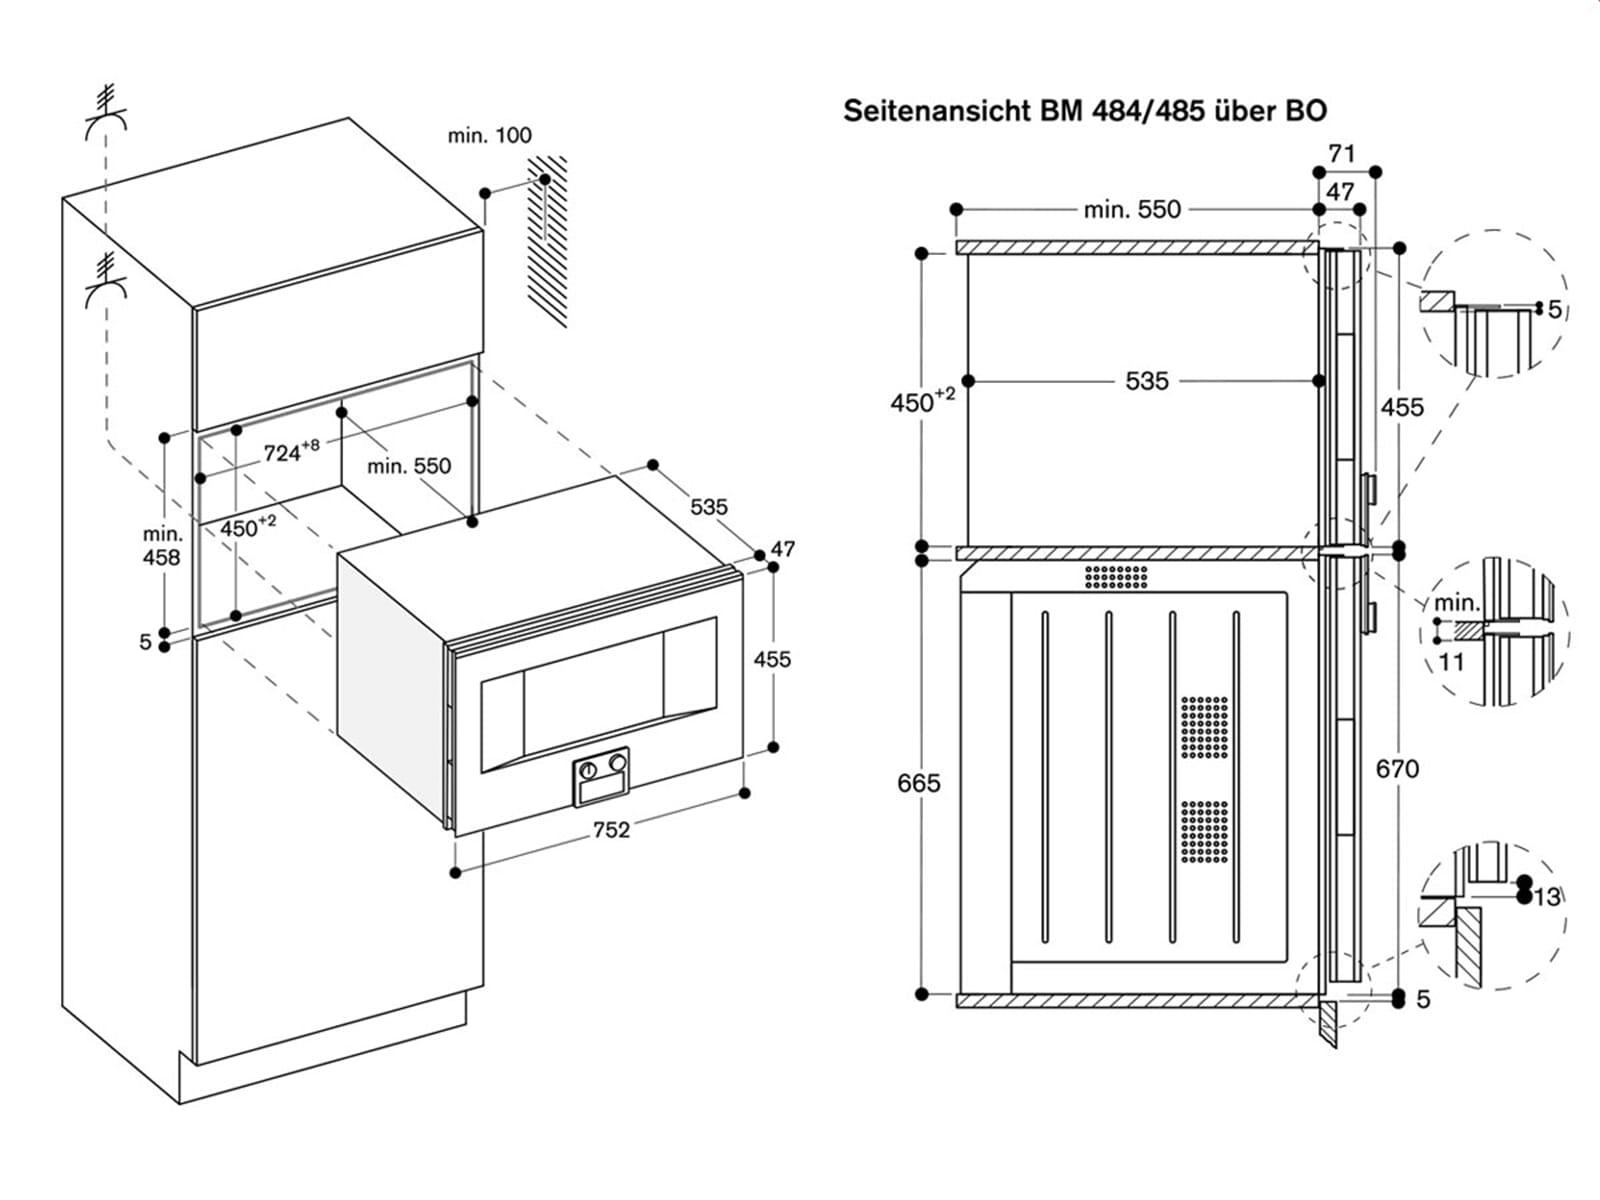 Gaggenau BM 485 110 Mikrowellen-Backofen Serie 400 Edelstahl/Glas